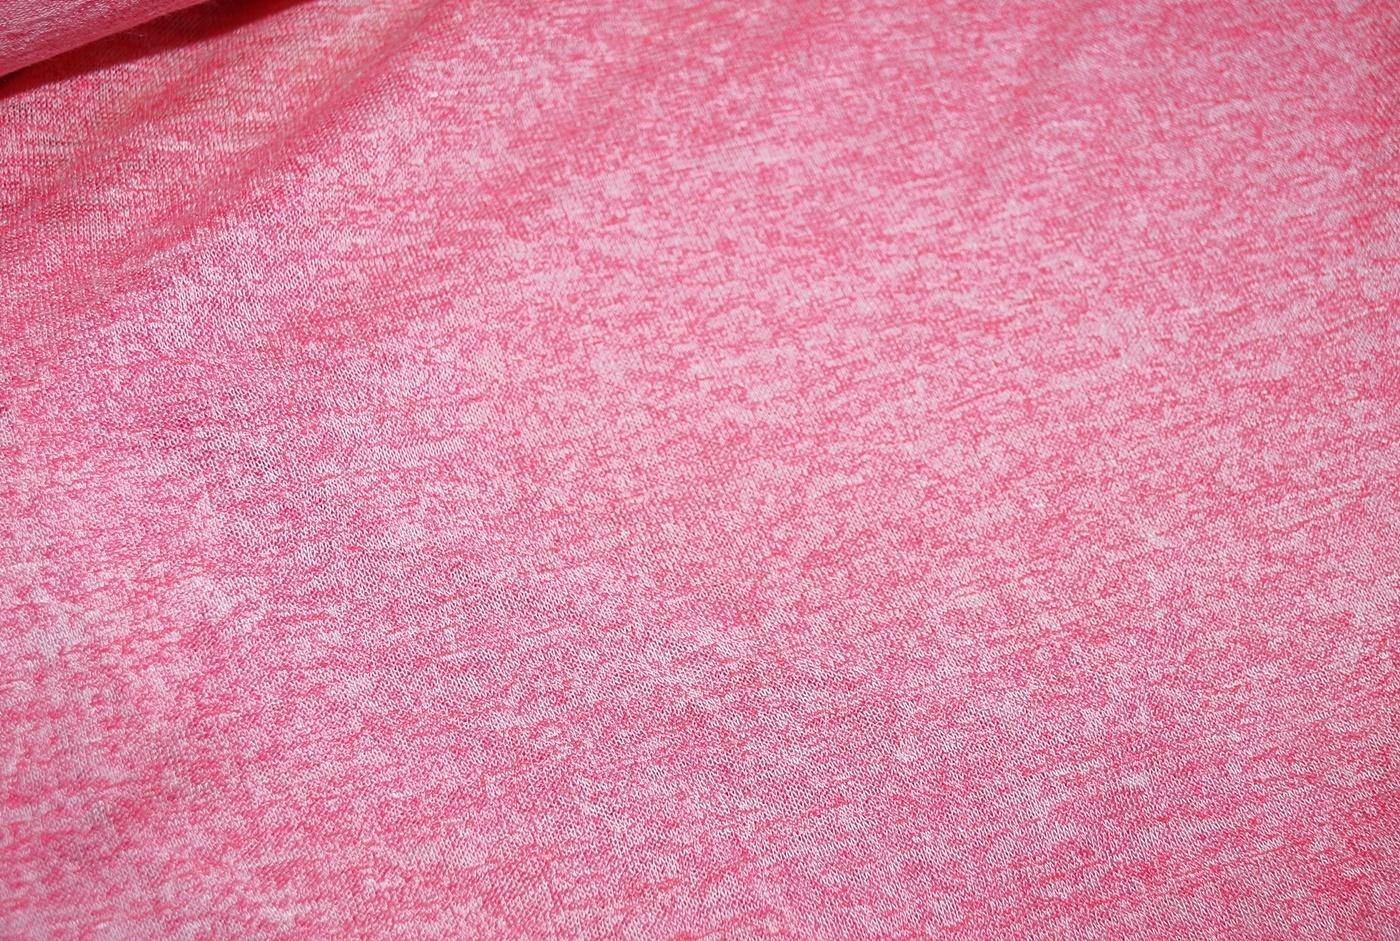 stoffe kaufen online feinstrick stoff rosa meliert. Black Bedroom Furniture Sets. Home Design Ideas